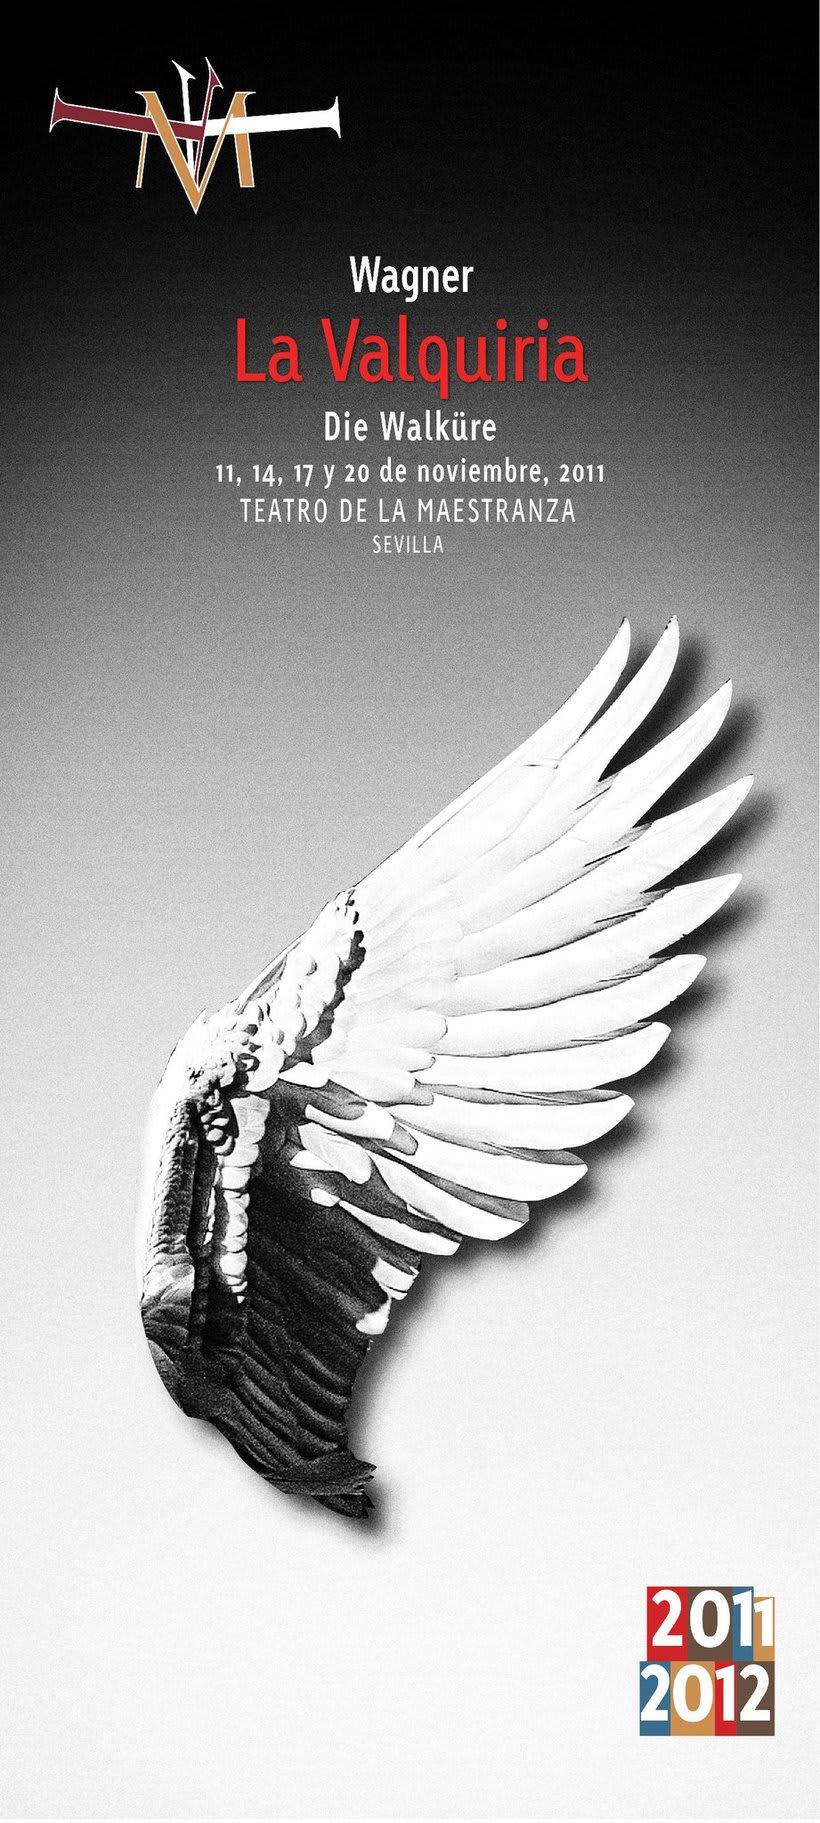 Óperas / Temporada 2011 / 2012 / Teatro de la Maestranza. Sevilla 2